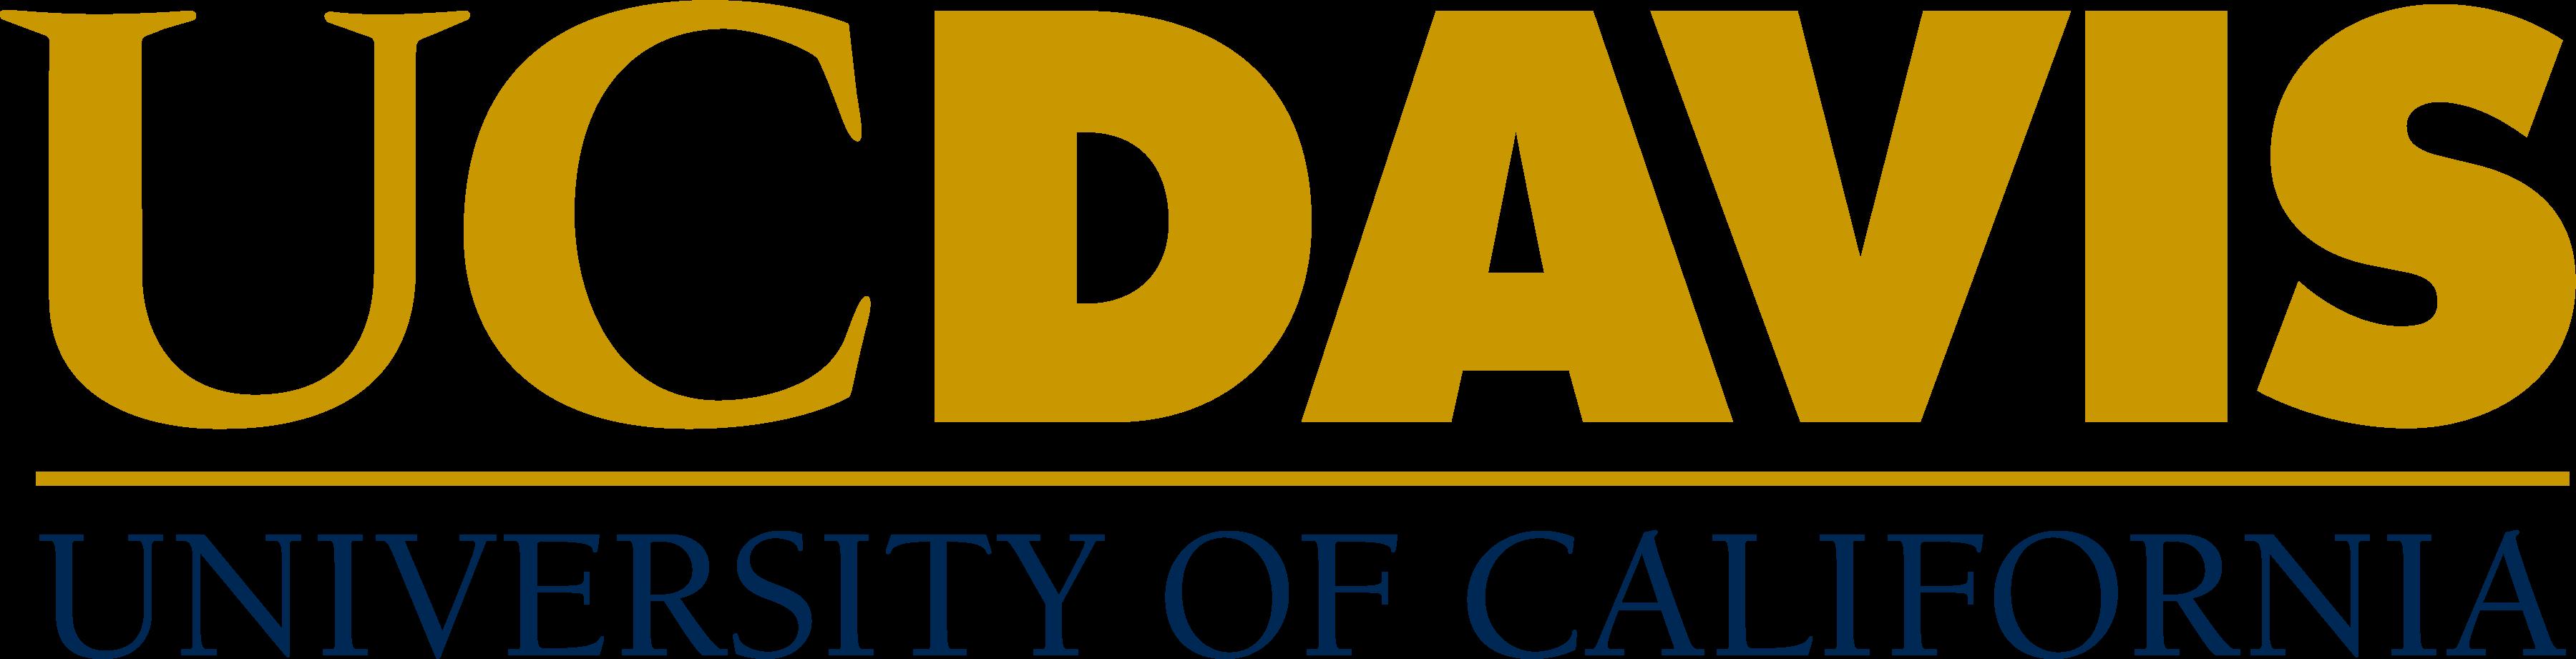 UC_Davis_wordmark